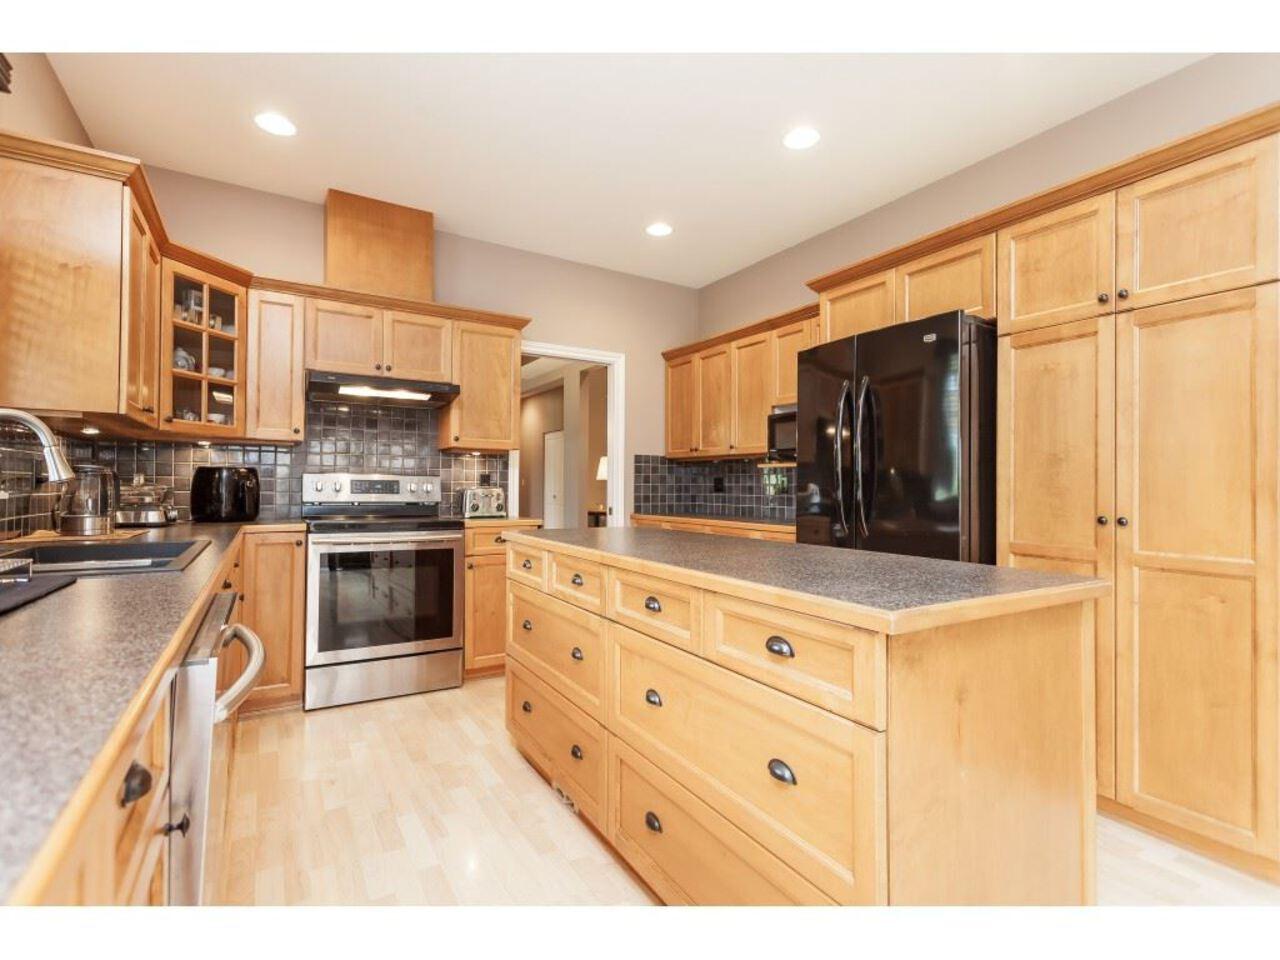 21058-85a-avenue-walnut-grove-langley-18 at 21058 85a Avenue, Walnut Grove, Langley